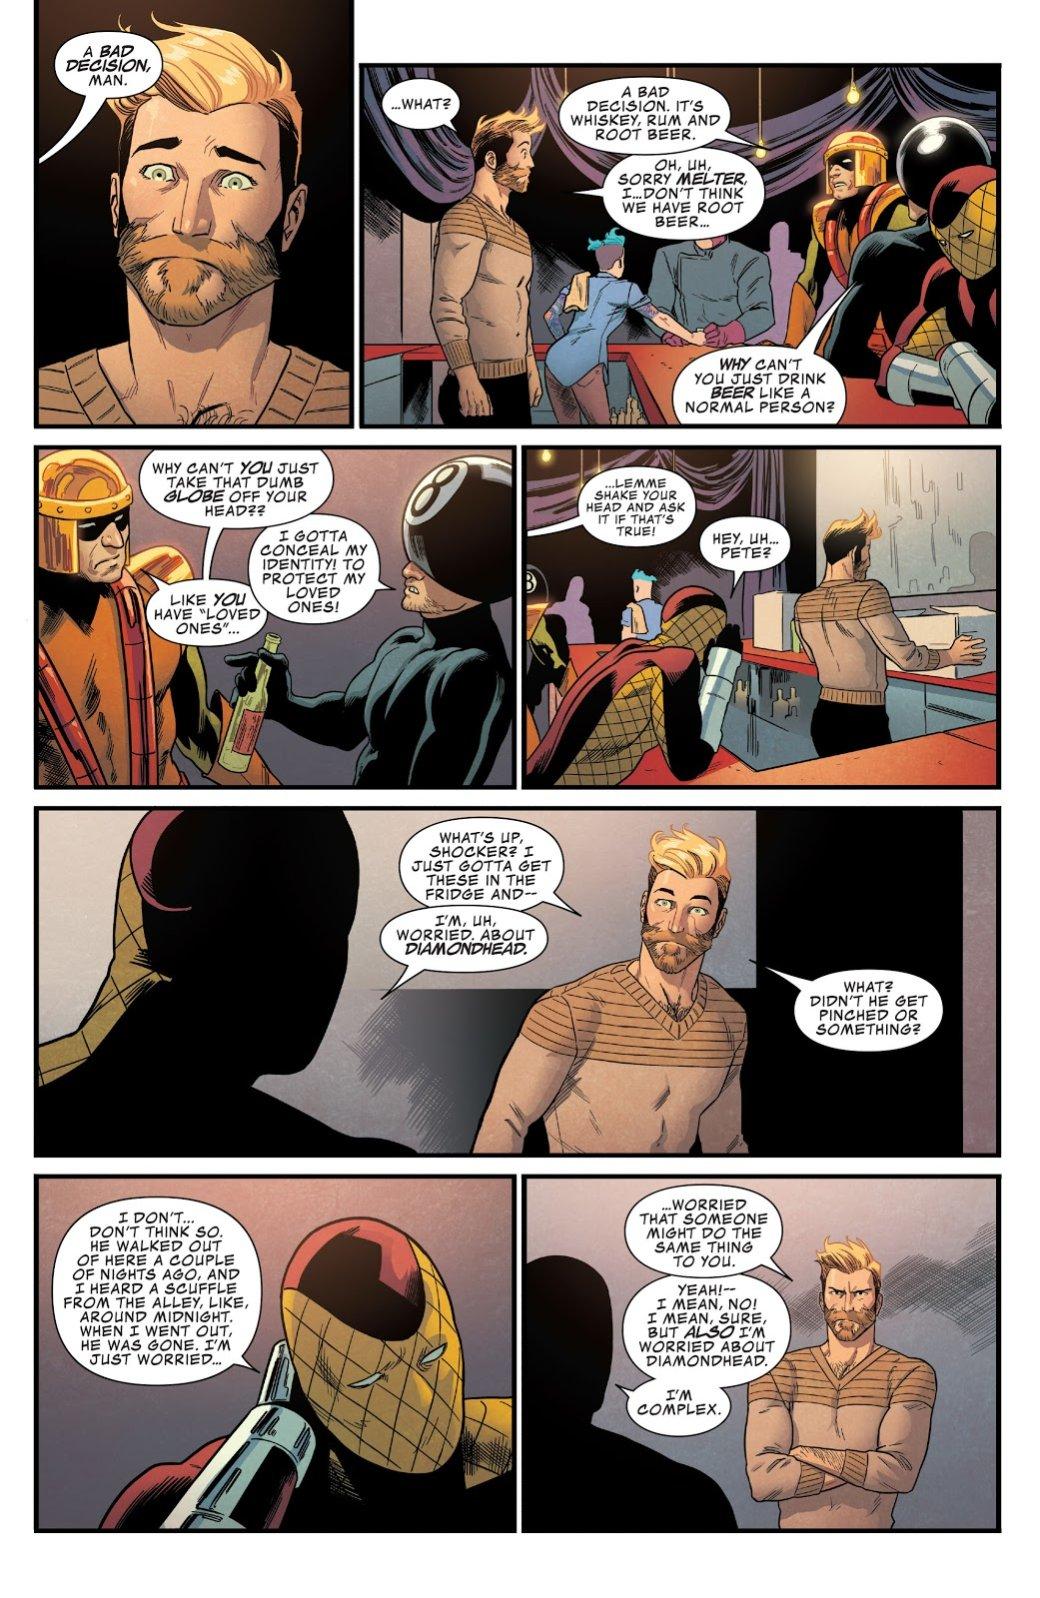 Открытия 2017— комиксы: Star-Lord, Infamous Iron Man, Batman: The White Knight. - Изображение 3